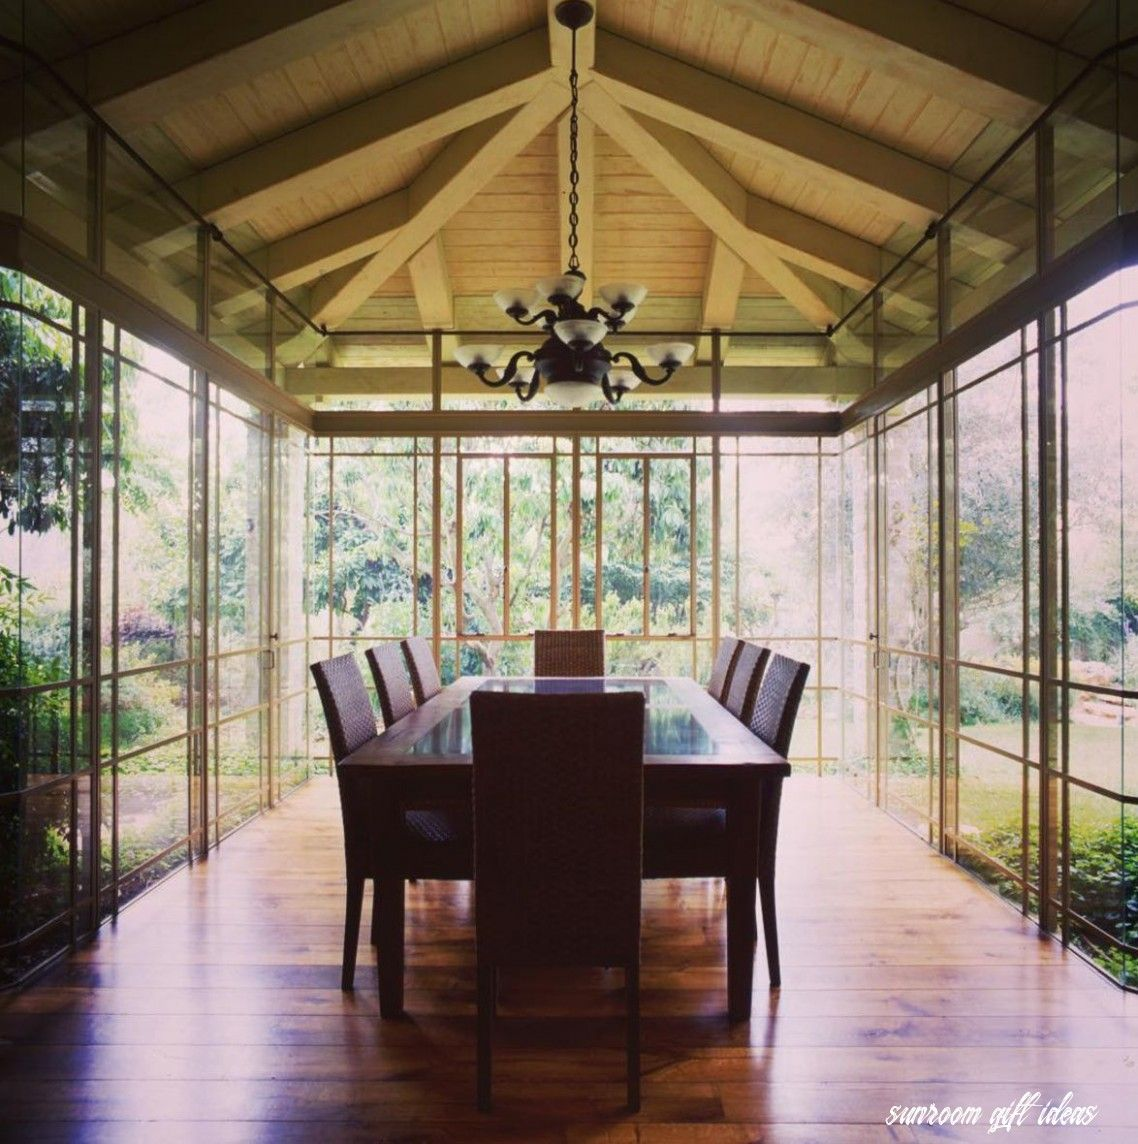 Interior Sunroom Addition Ideas: Pin On Best Home Design Ideas